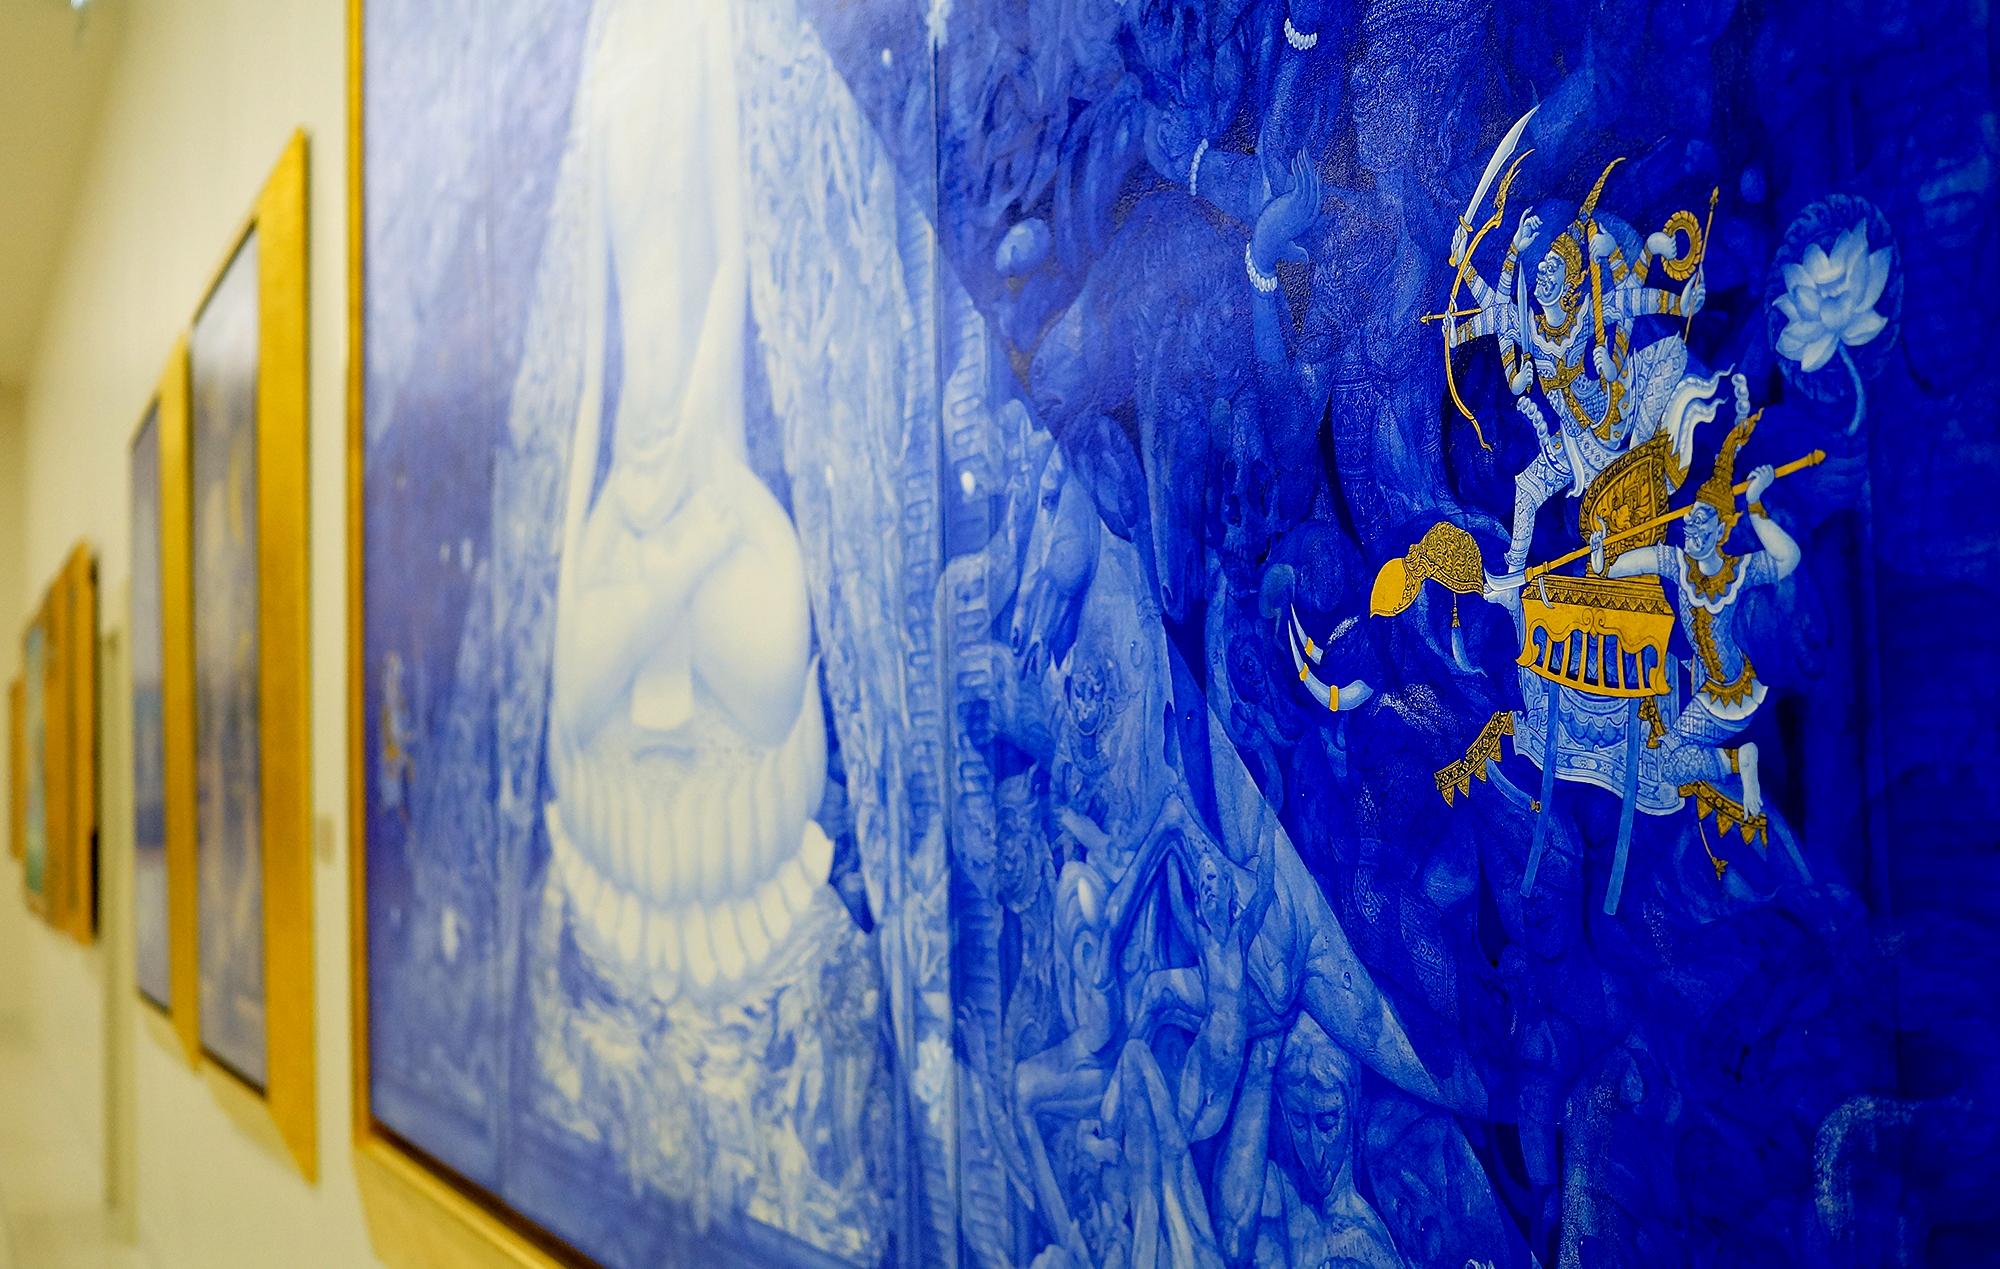 """Buddha's Enlightenment 2011"" by Thongchai Srisukprasert"